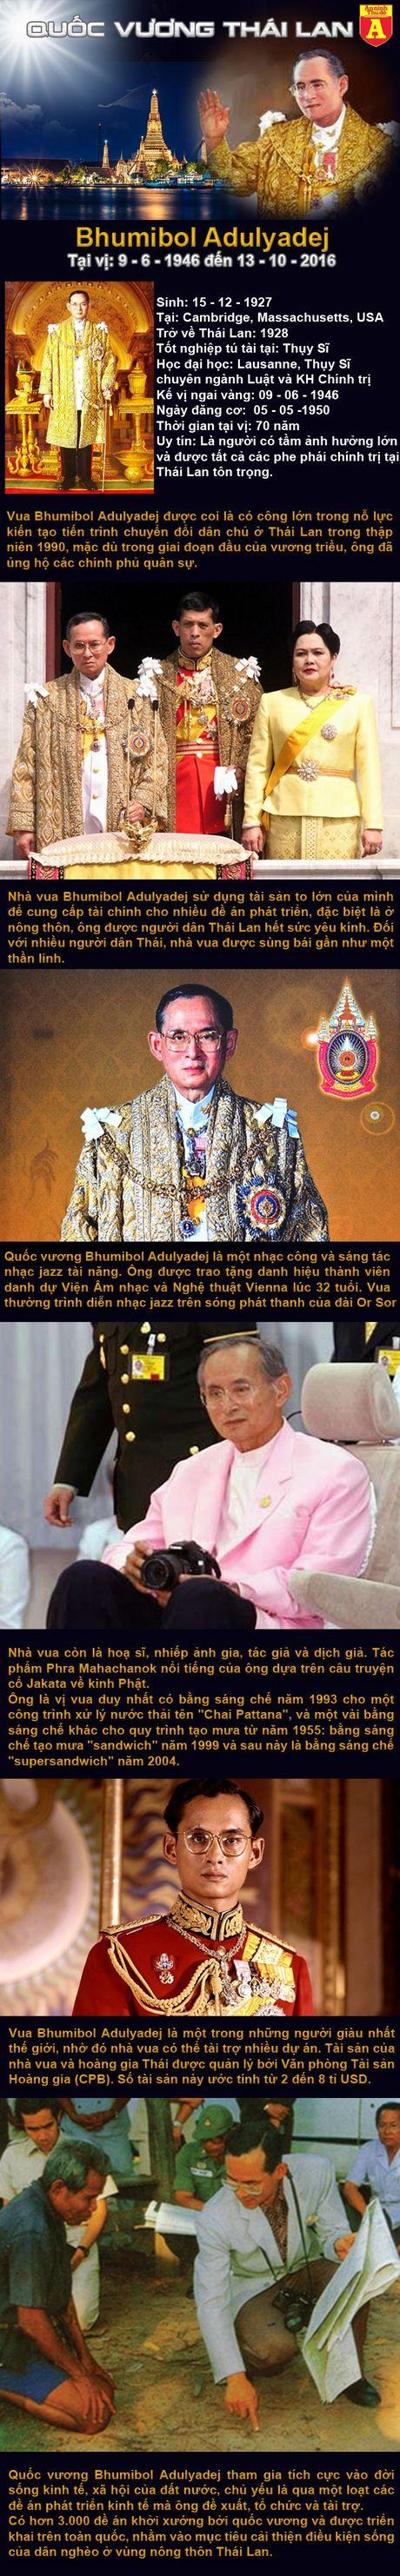 Chan dung Vi vua duoc 68 trieu nguoi Thai yeu kinh - Anh 1